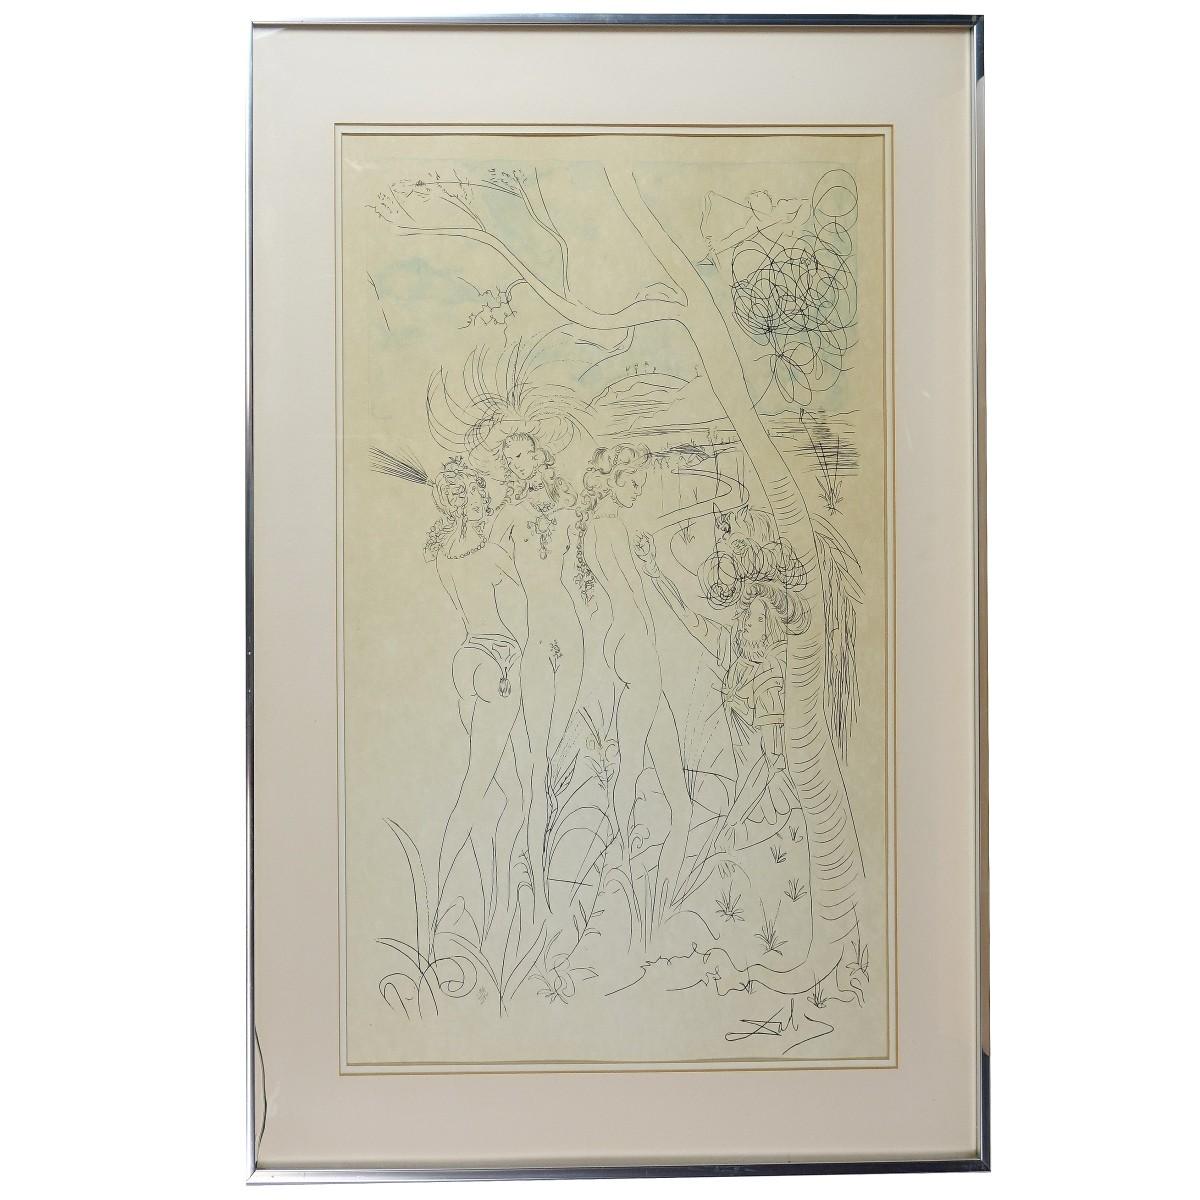 Lot 249: Salvador Dali (Spanish, 1904-1989) Dream Caused